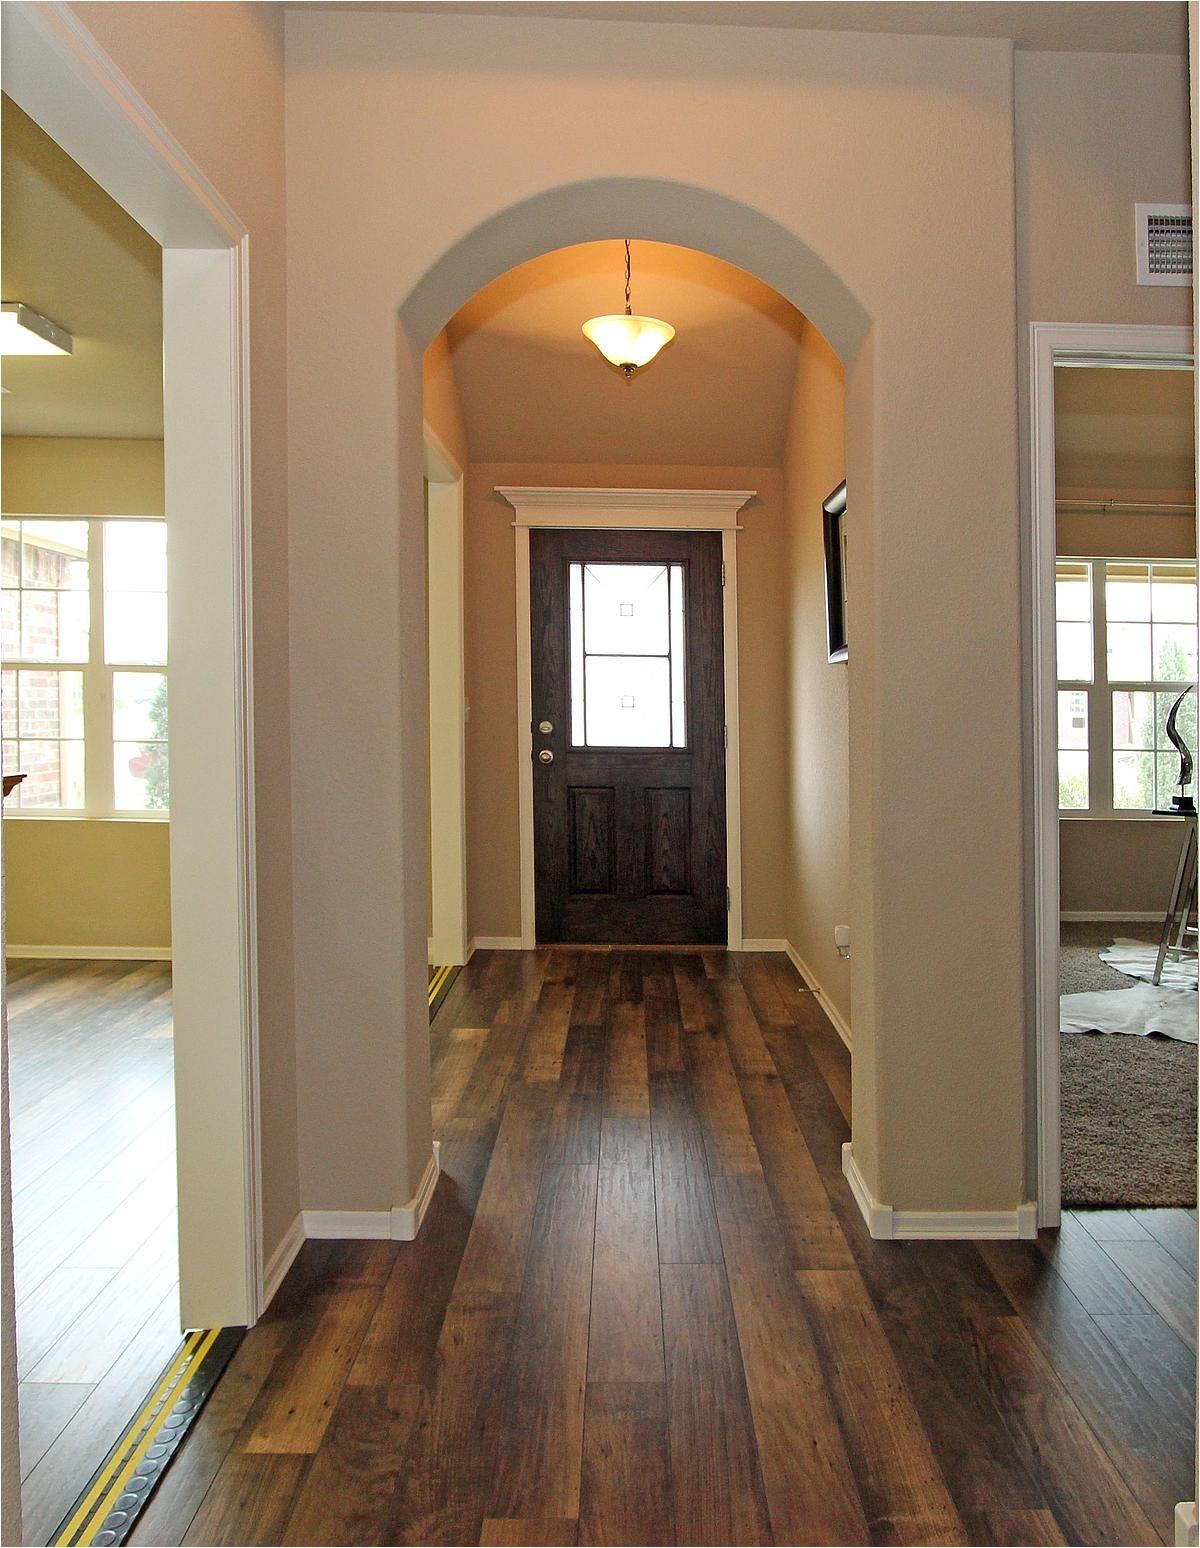 Apartments with Hardwood Floors Tulsa Ok Simmons Homes Shiloh 05 02sb Simmons Homes Tulsa Ok Pinterest